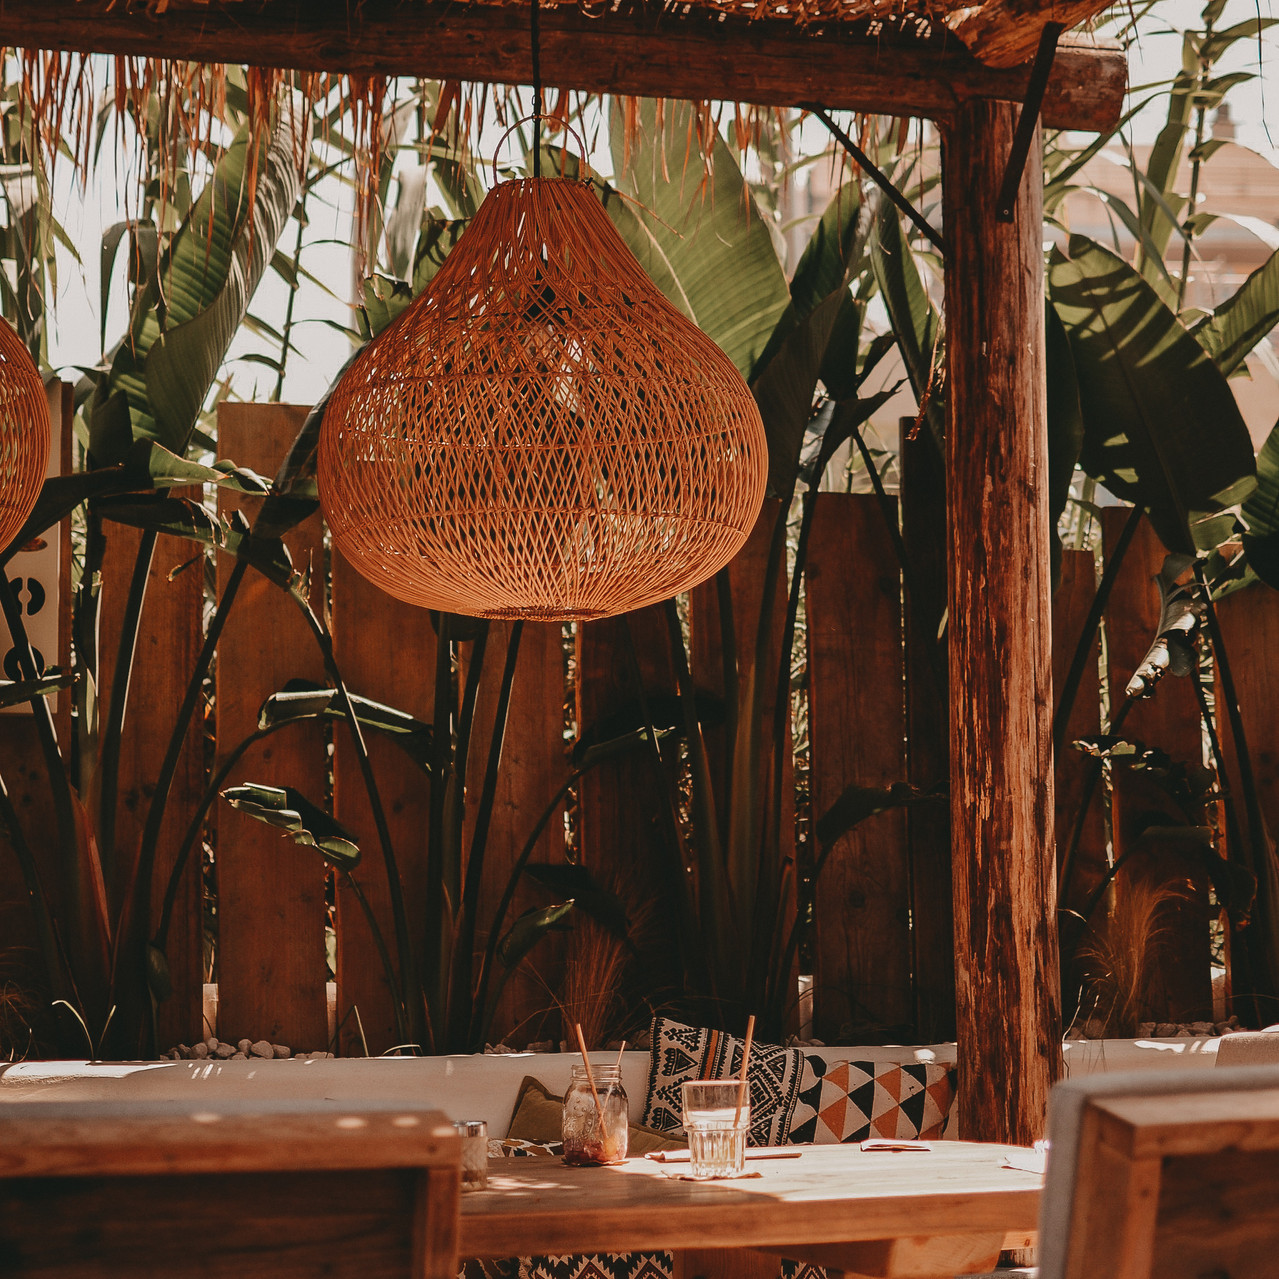 Coco Beachhouse in Cala RatjDSC_2021